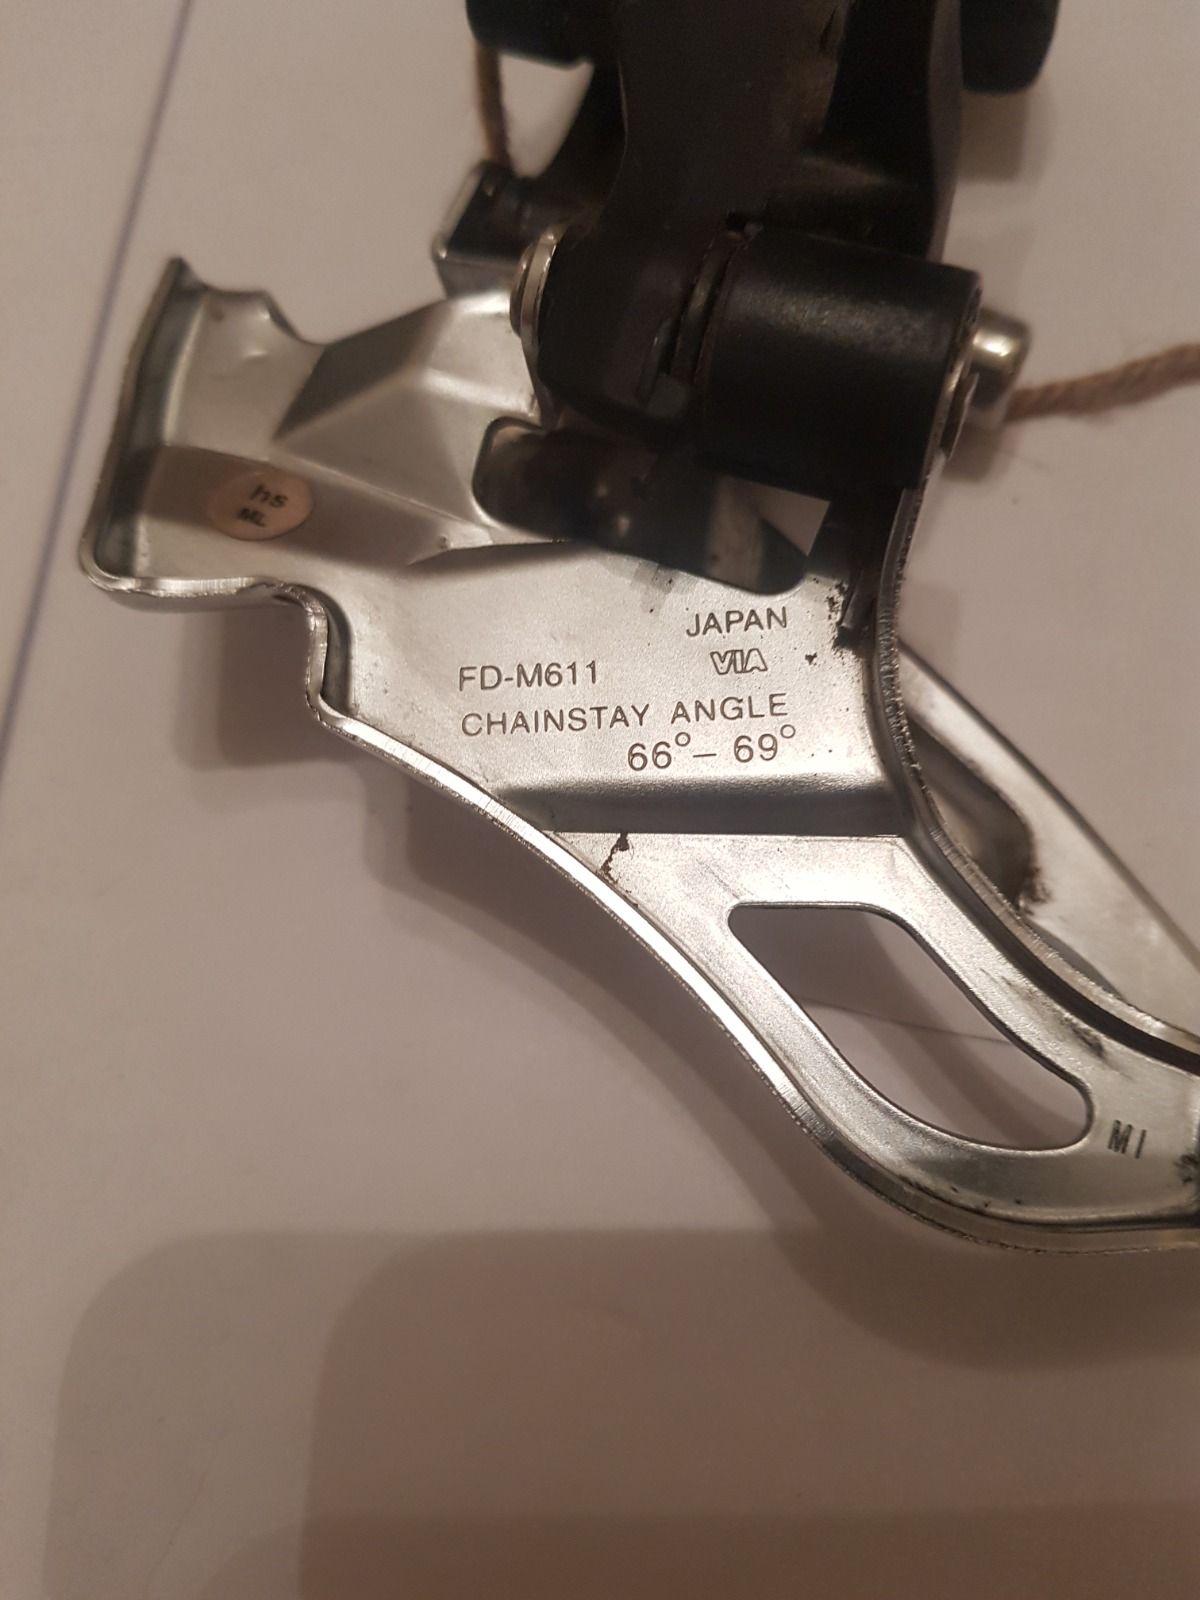 Передний переключатель Shimano Deore FD-M611